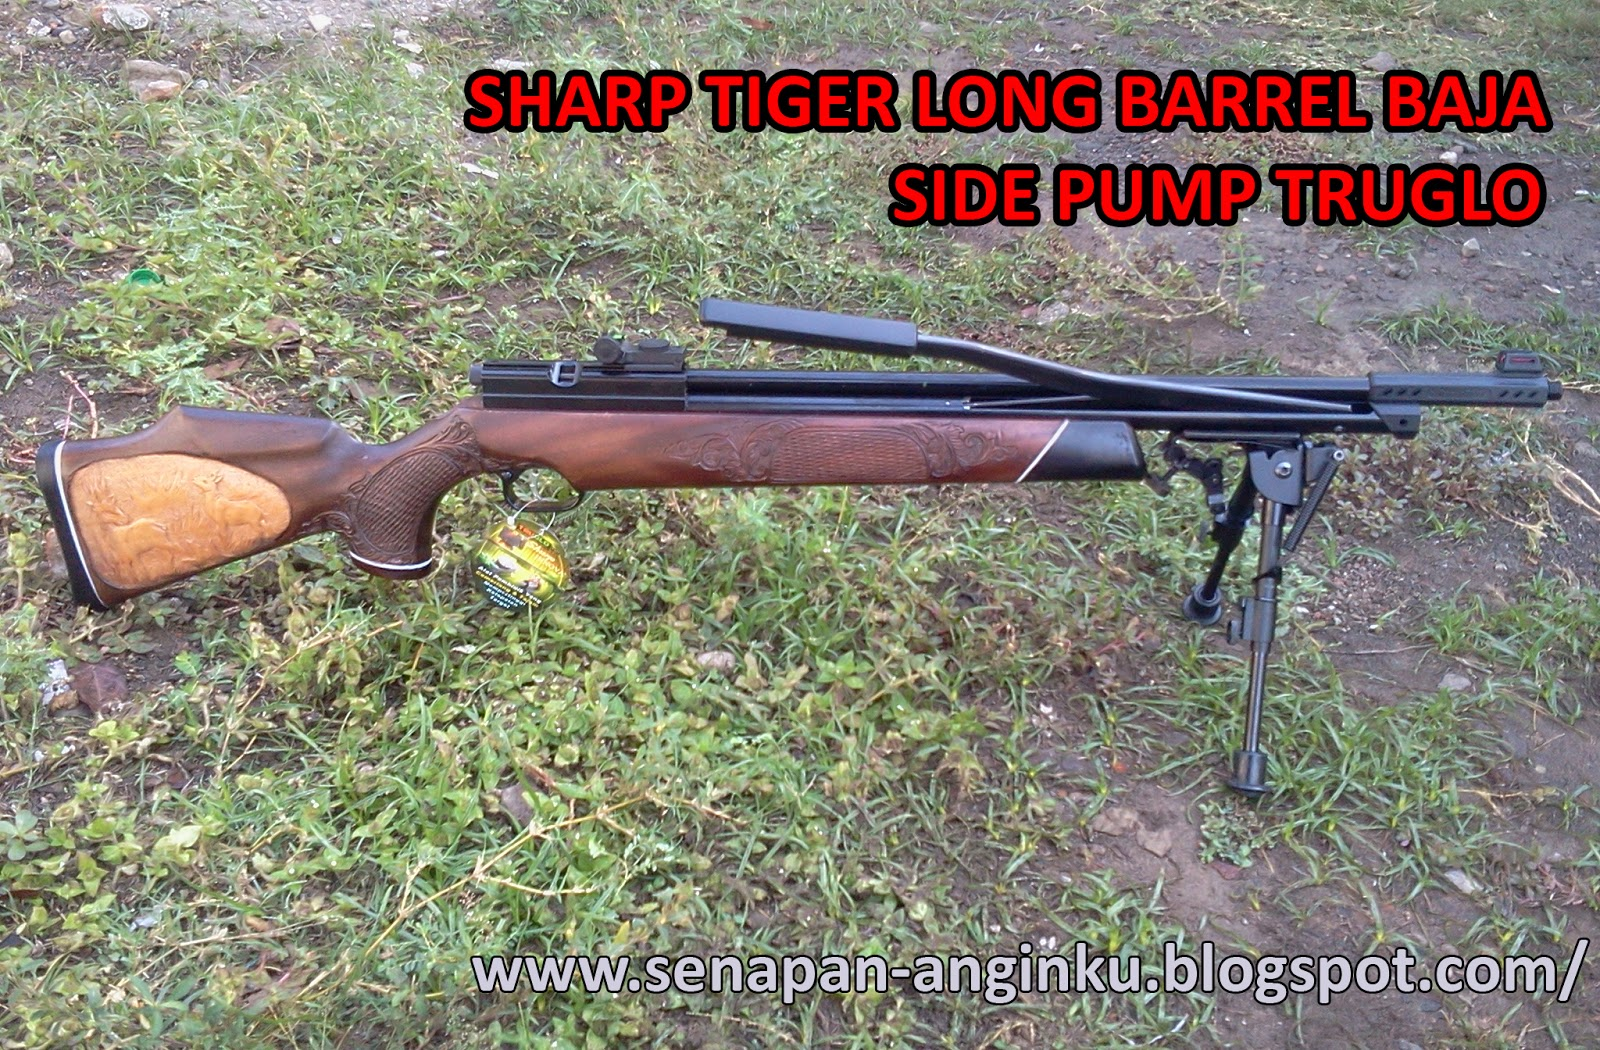 Sharp Tiger Long Barrel Baja Side Pump Truglo